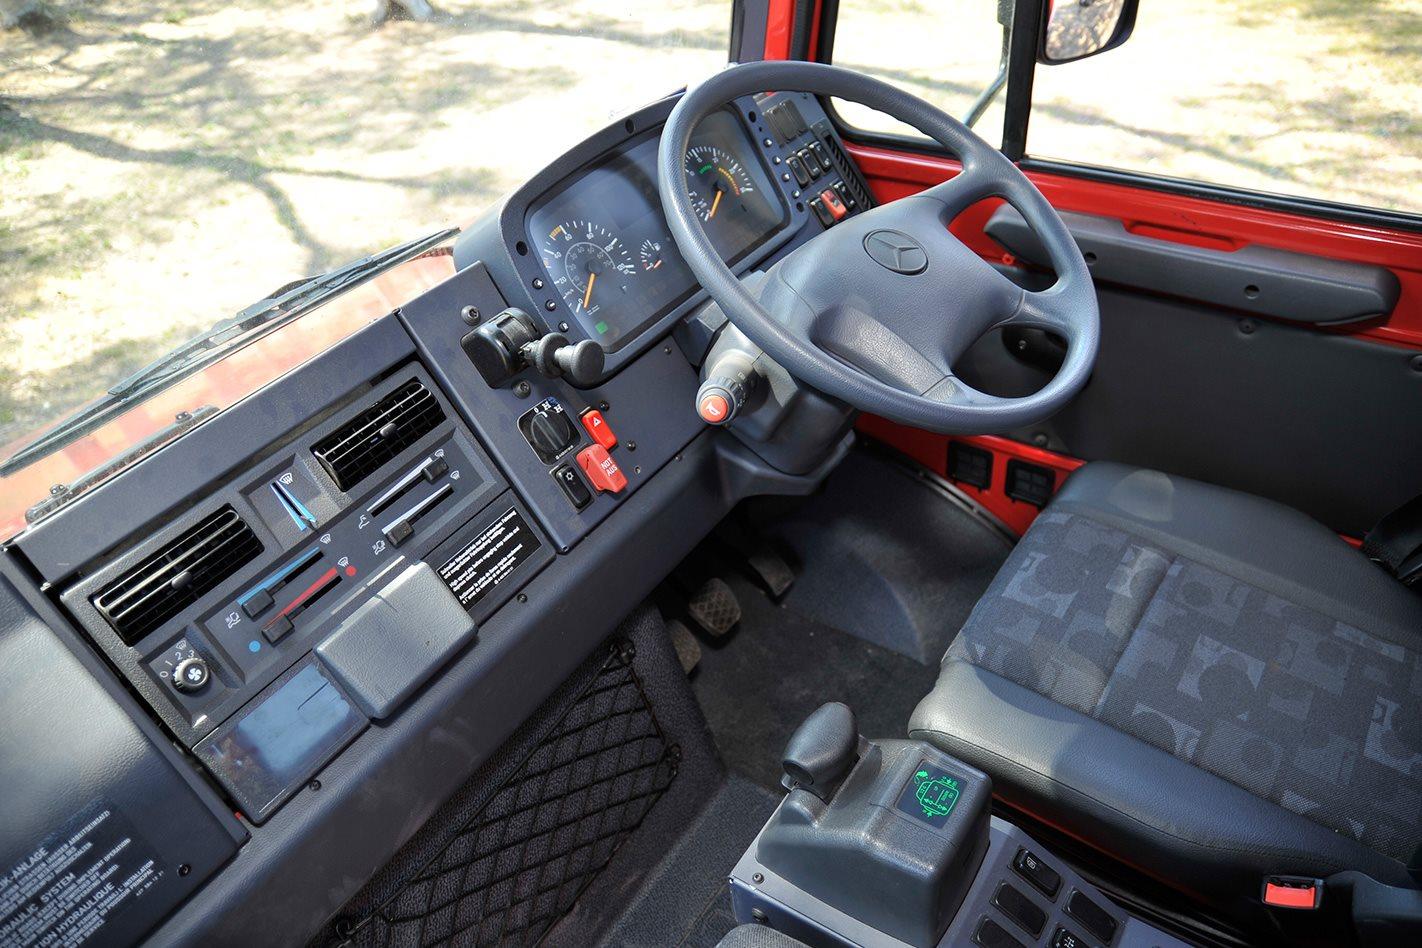 Mercedes Benz Unimog U5000 cabin